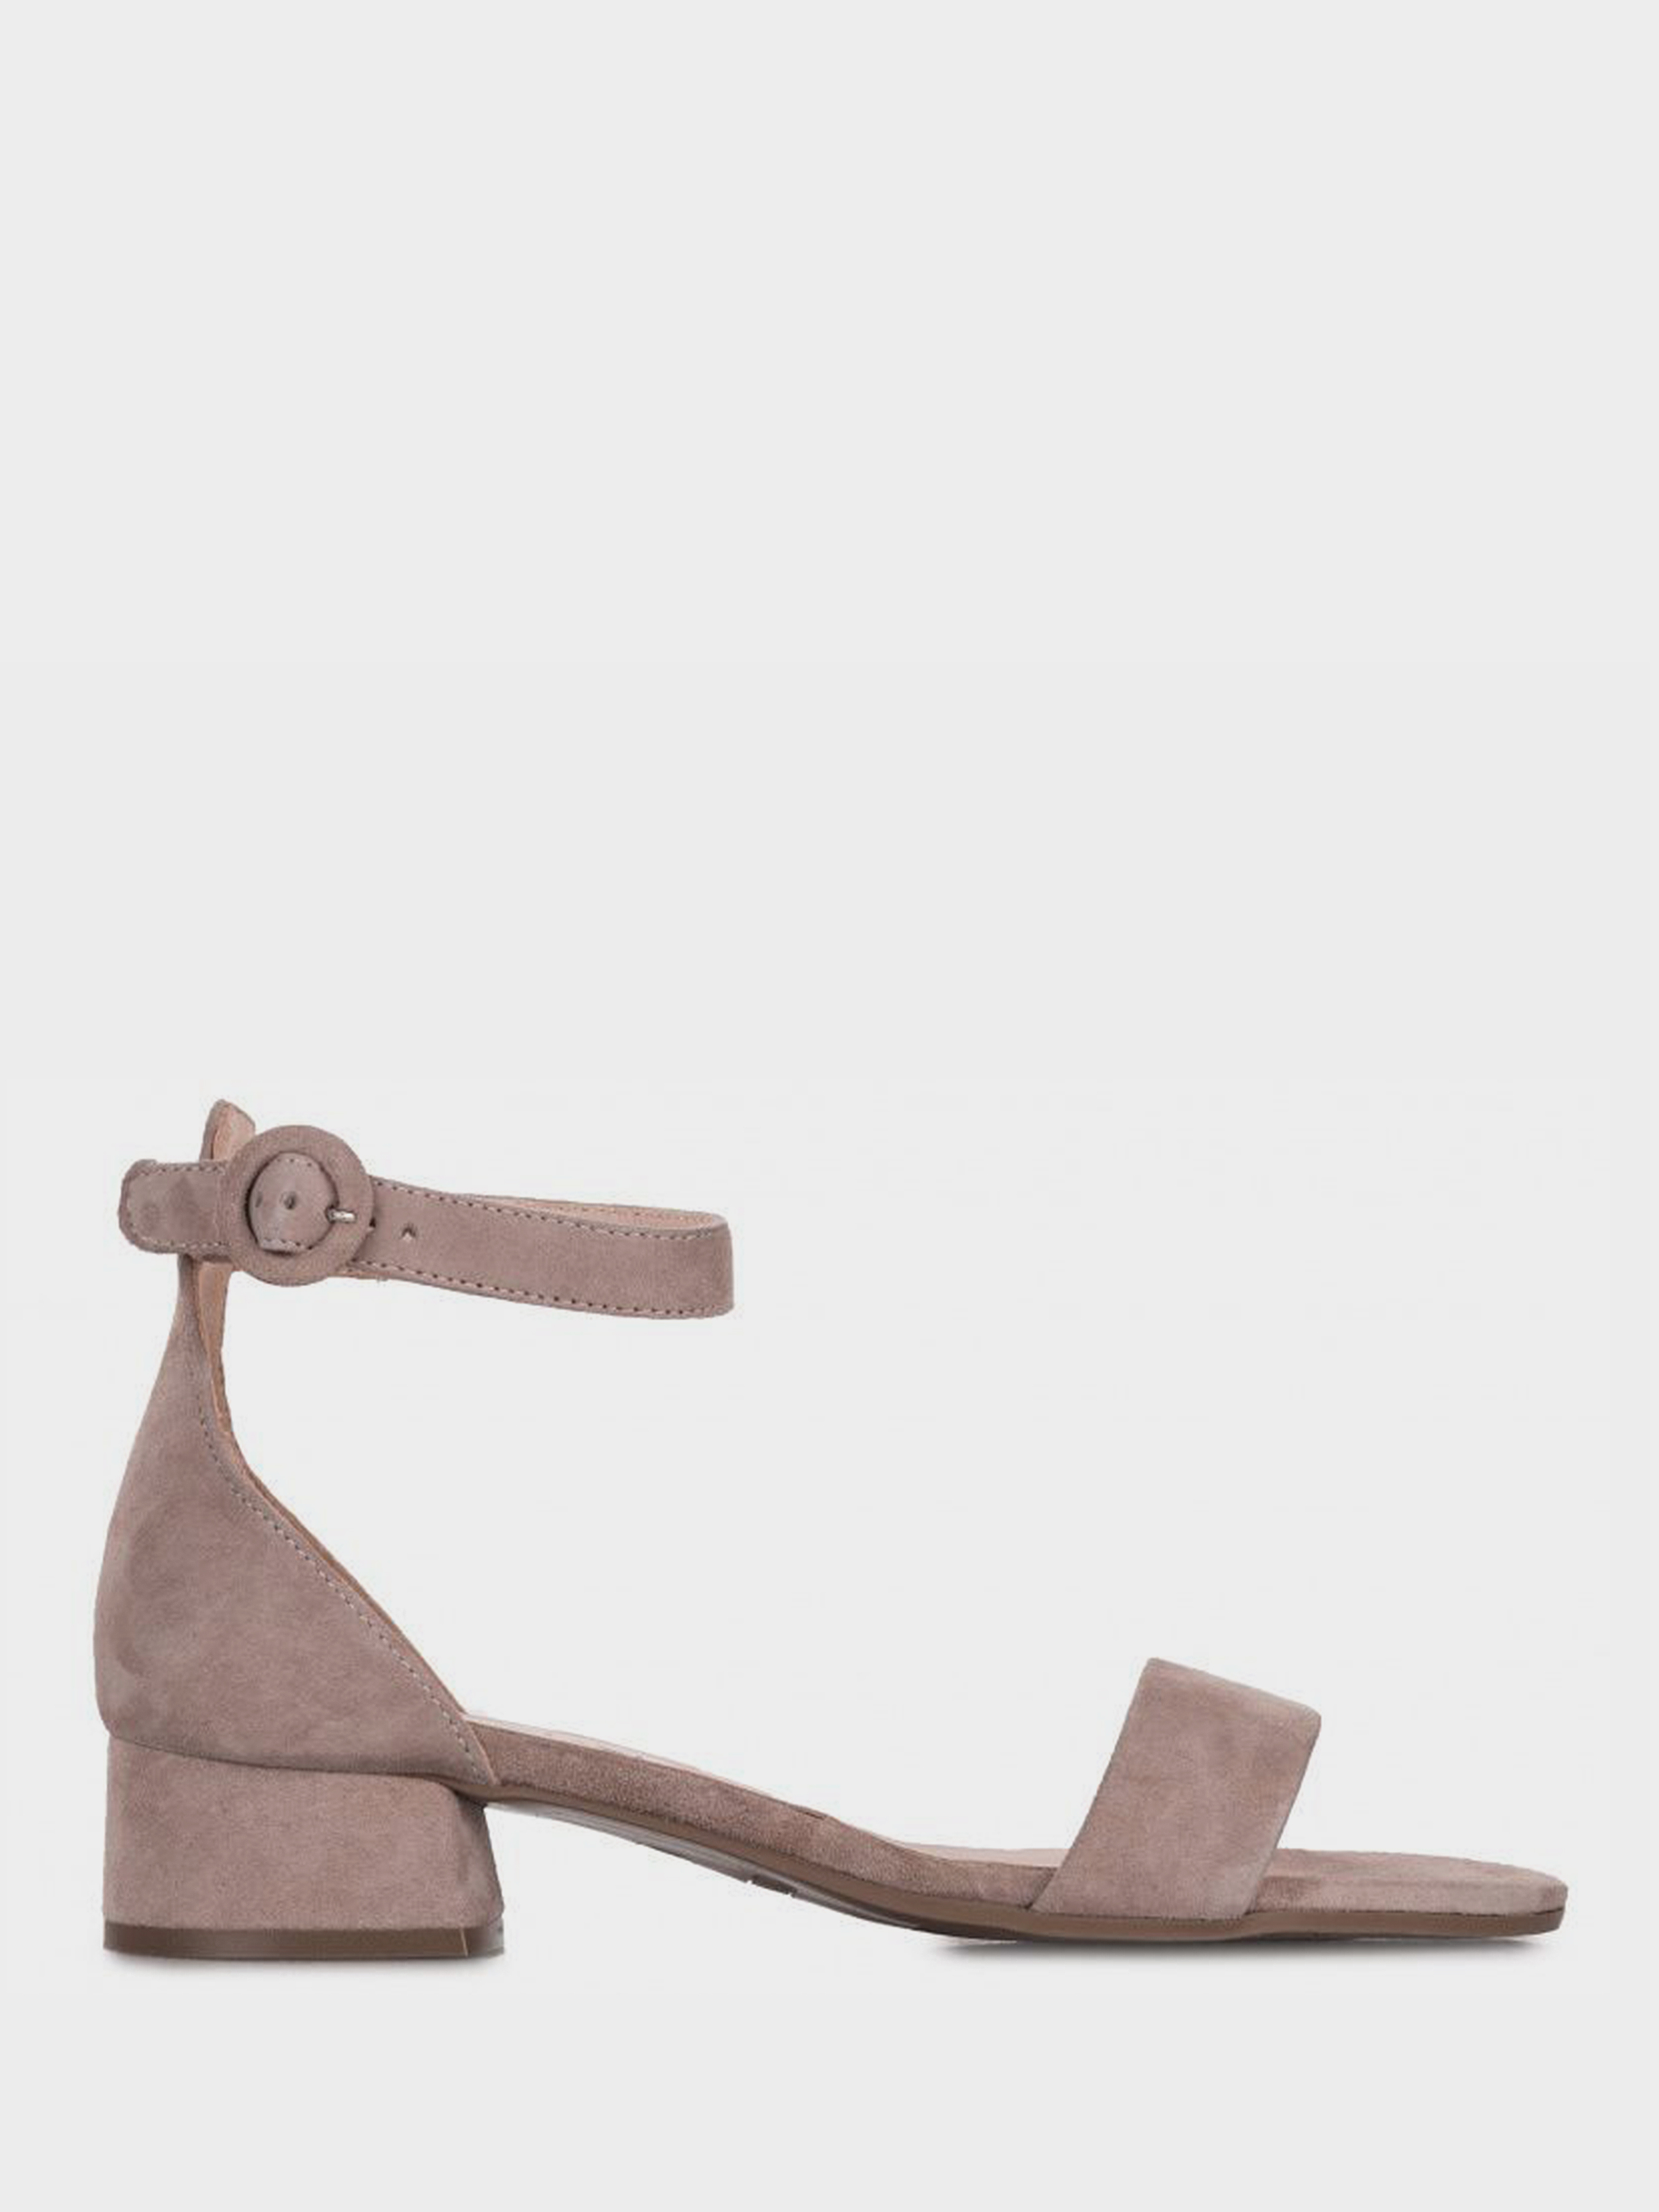 Босоножки для женщин Braska босоніжки жін. (36-41) 8Y11 модная обувь, 2017